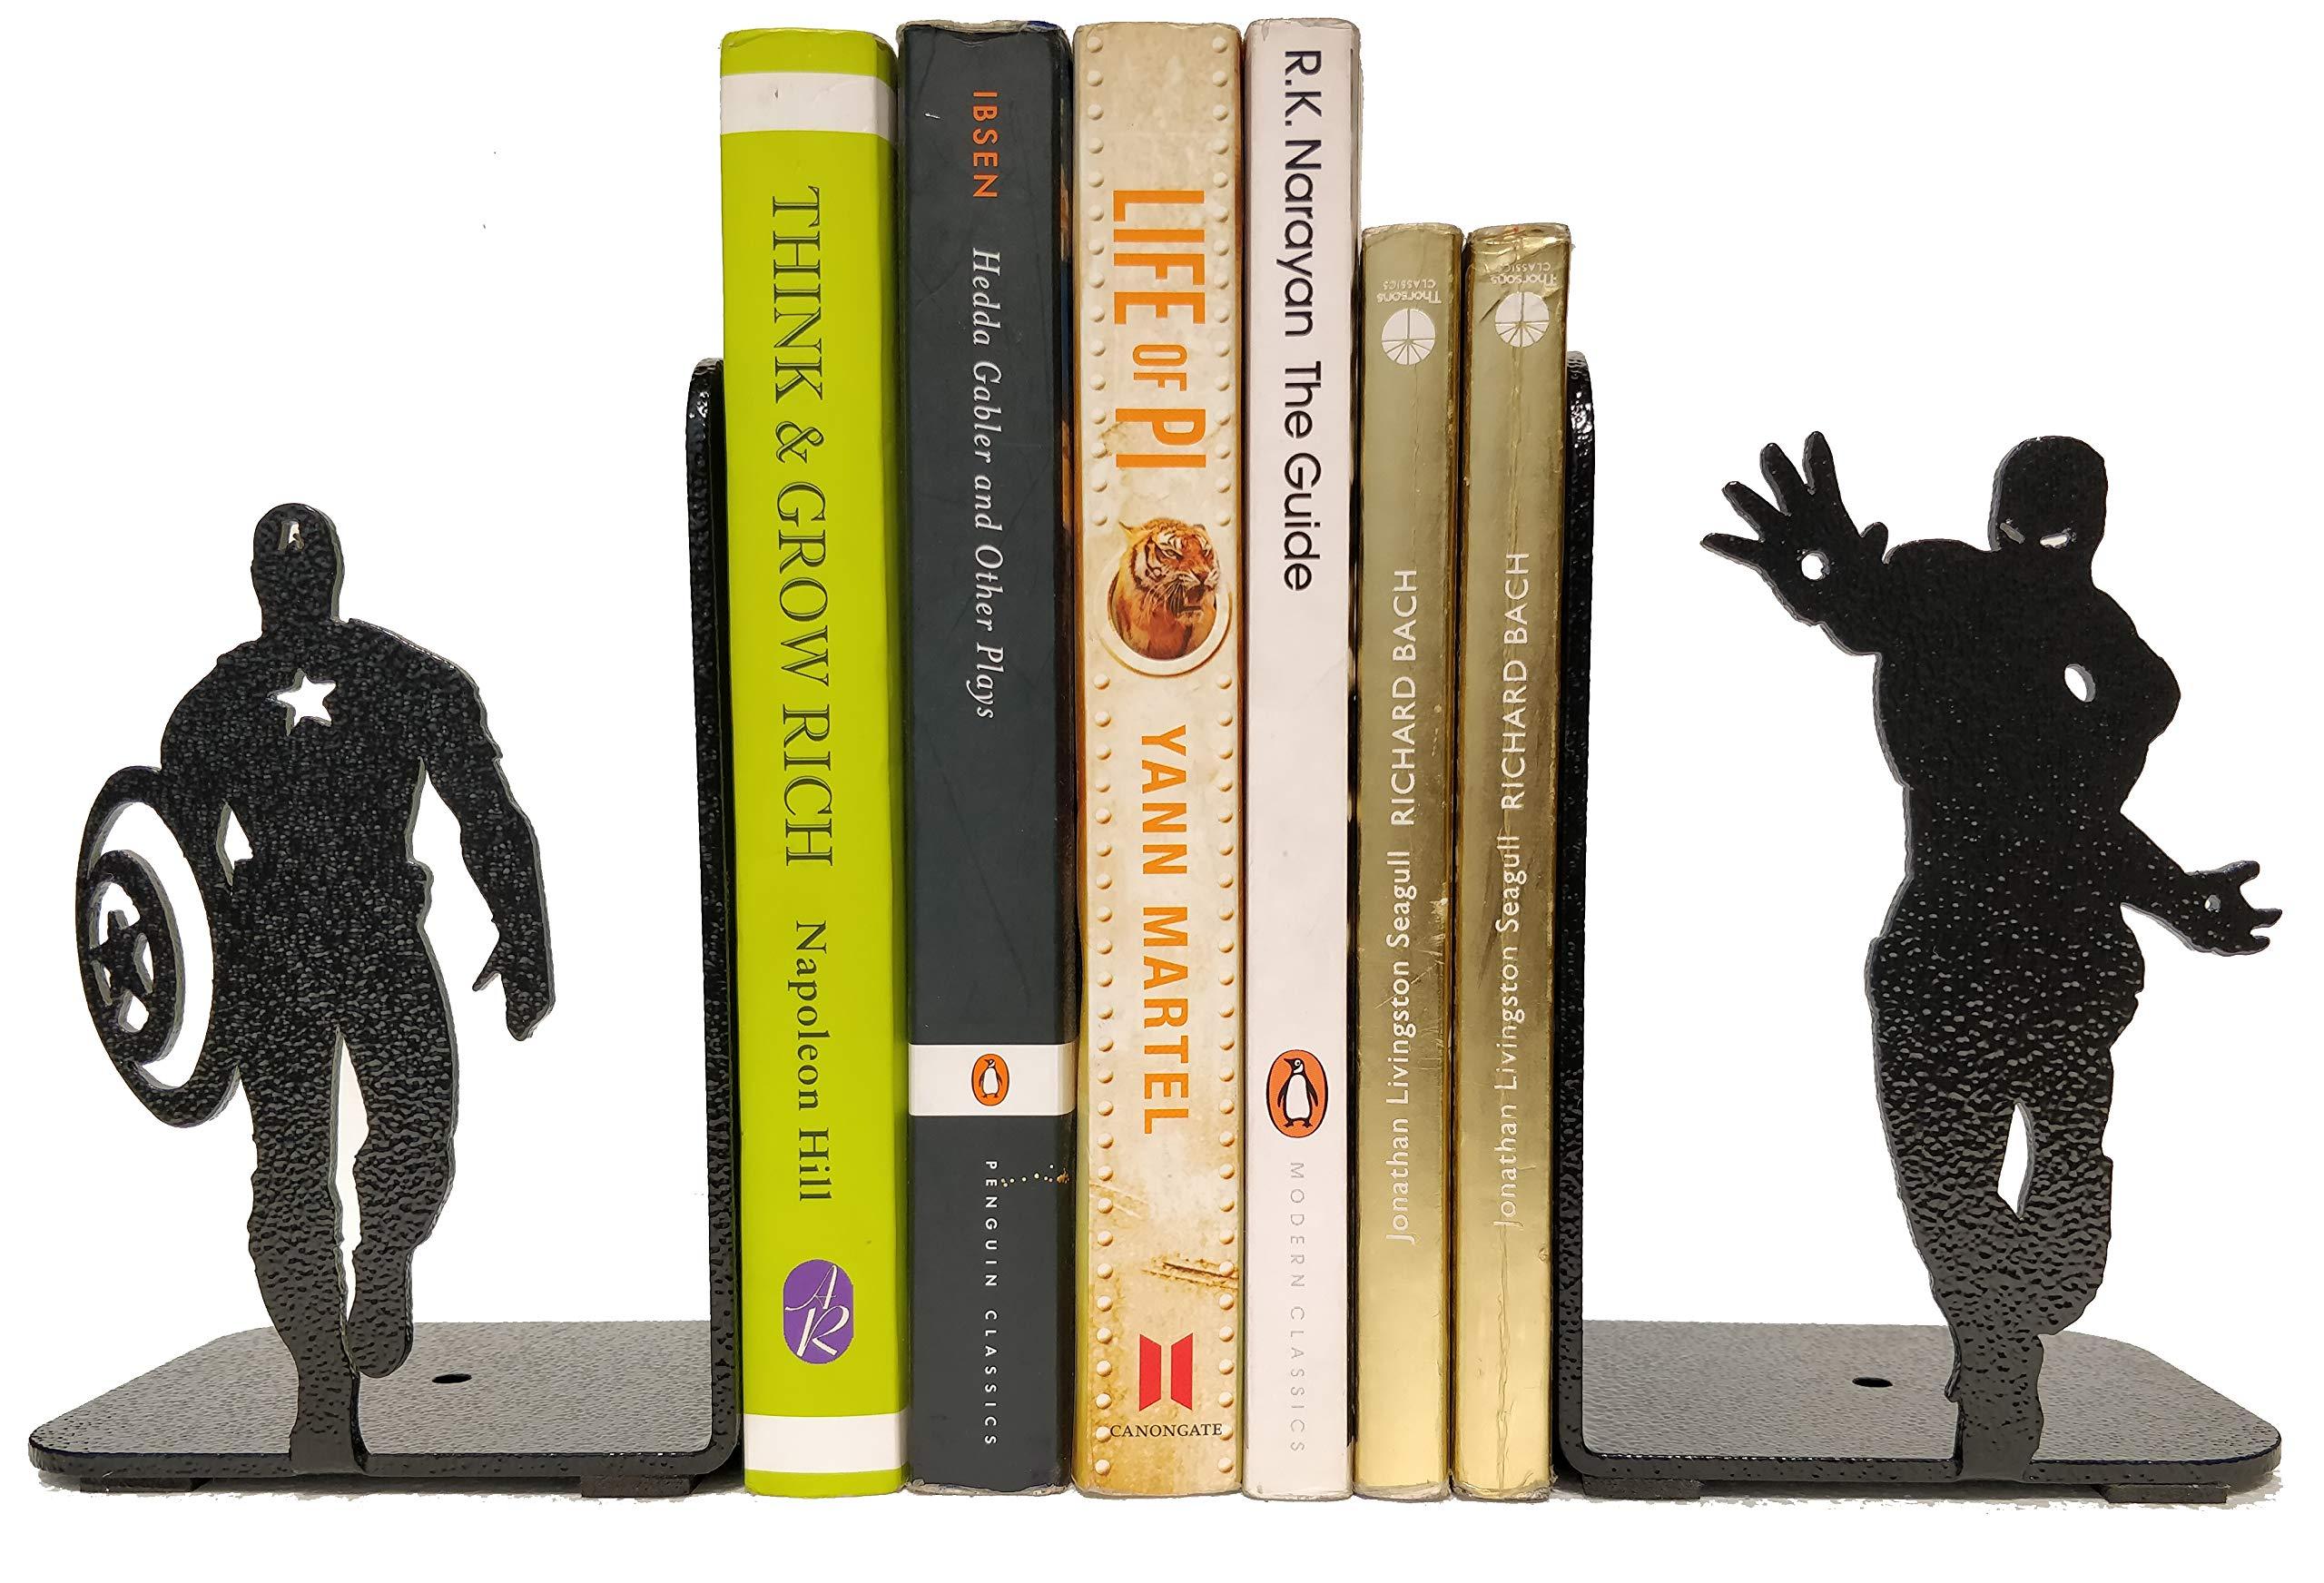 HeavenlyKraft Superheros Decorative Metal Bookend, Non Skid Book End, Book Stopper for Home/Office Decor/Shelves, 5.9 X 3.9 X 3.14 Inch Per Piece by HeavenlyKraft